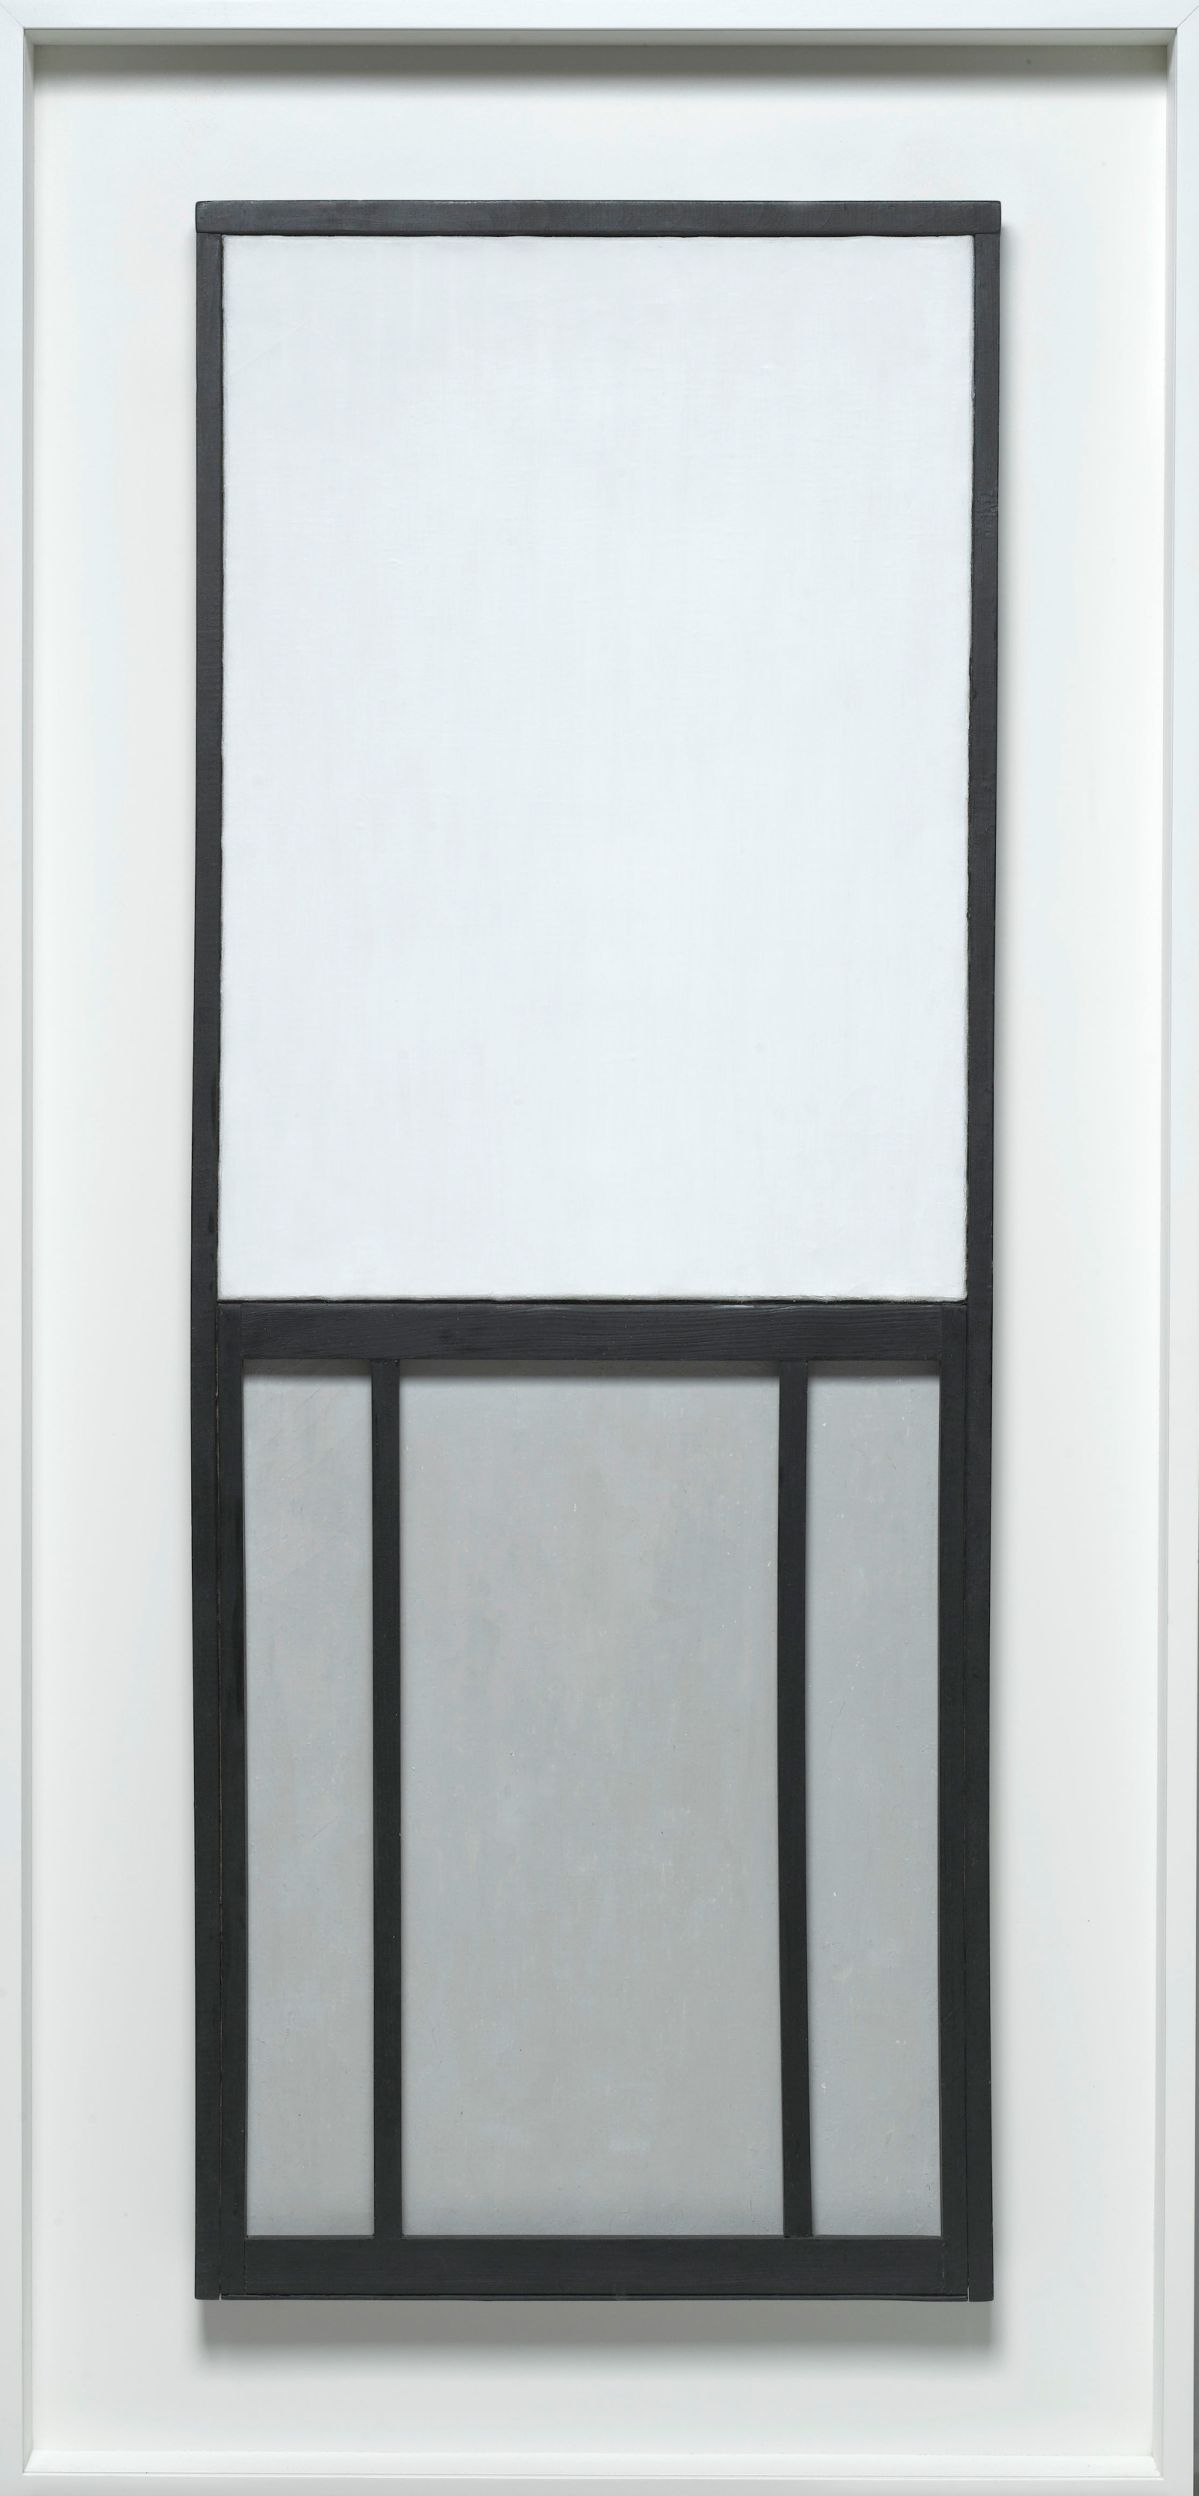 Ellsworth Kelly, Window Museum of Modern Art Paris, 1949